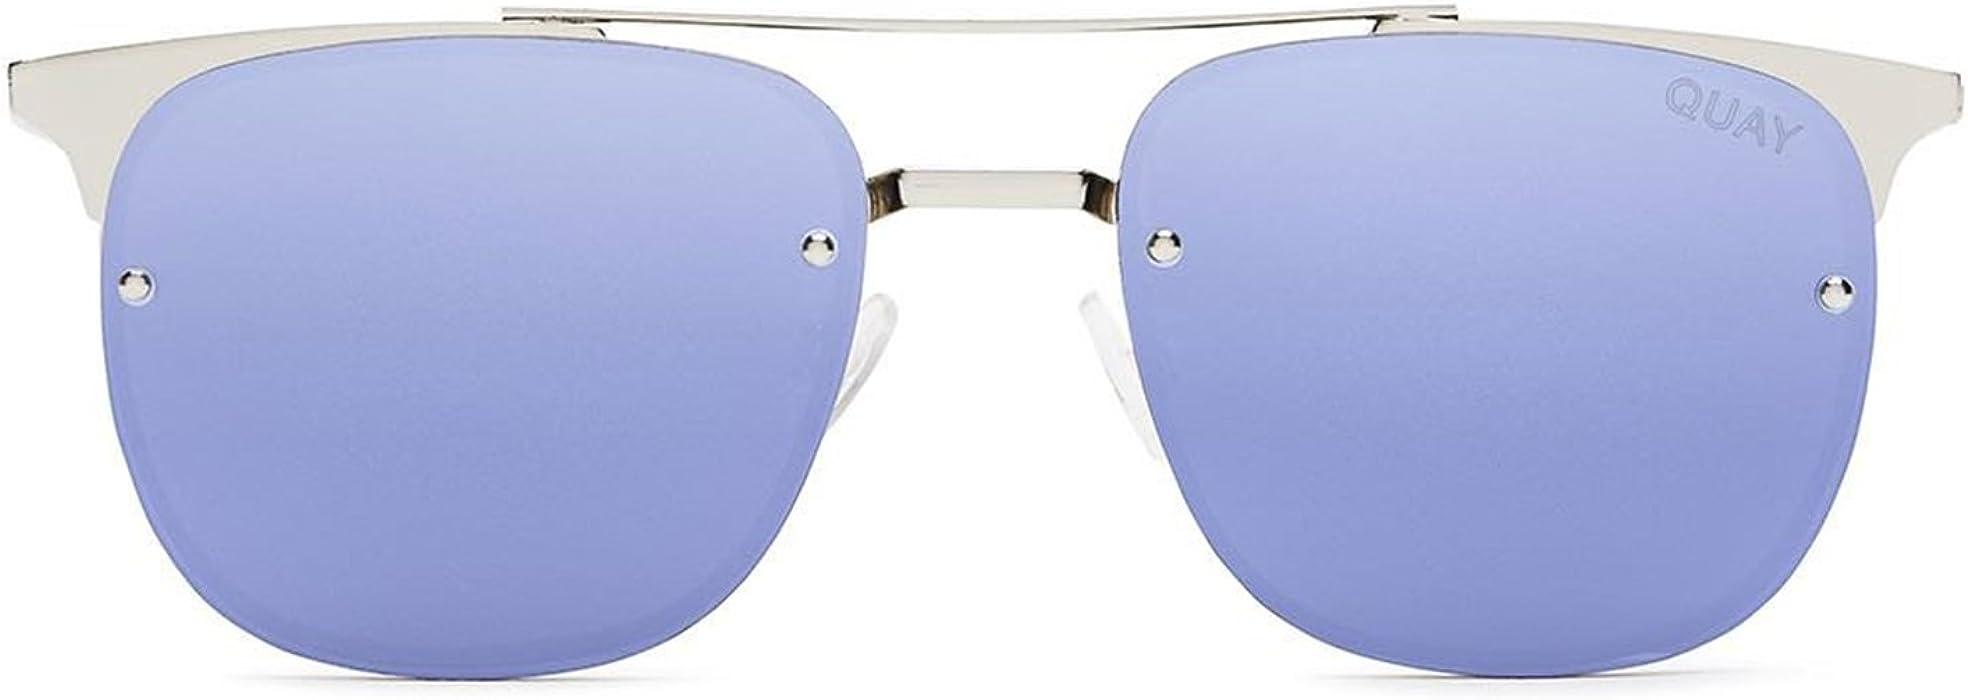 e7ce07136b312 Amazon.com  Quay Women s Private Eyes Sunglasses